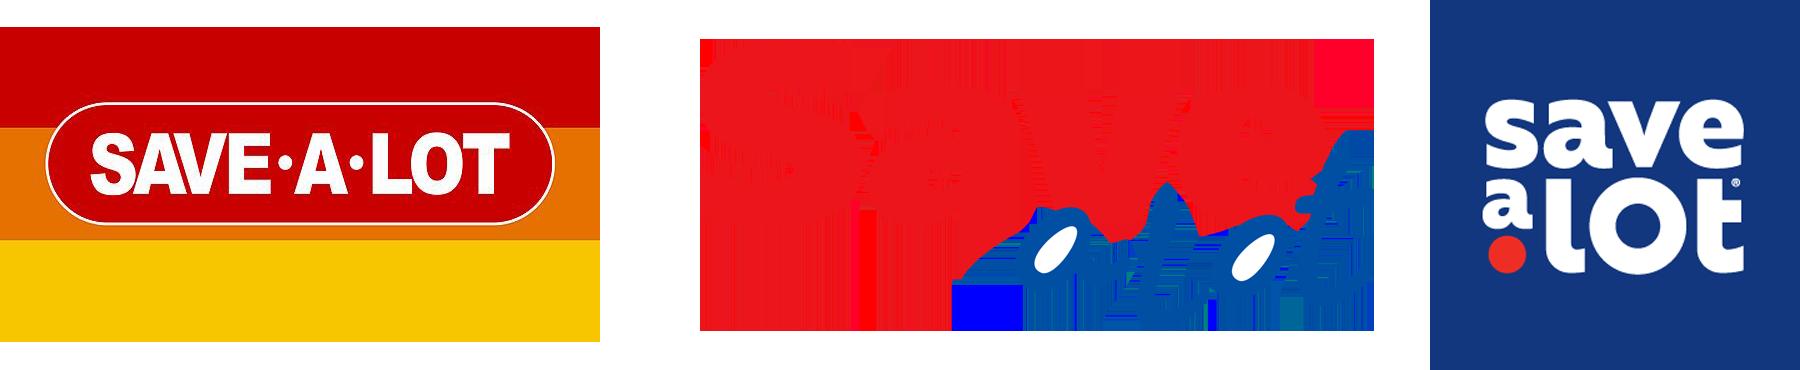 Save-A-Lot logo history